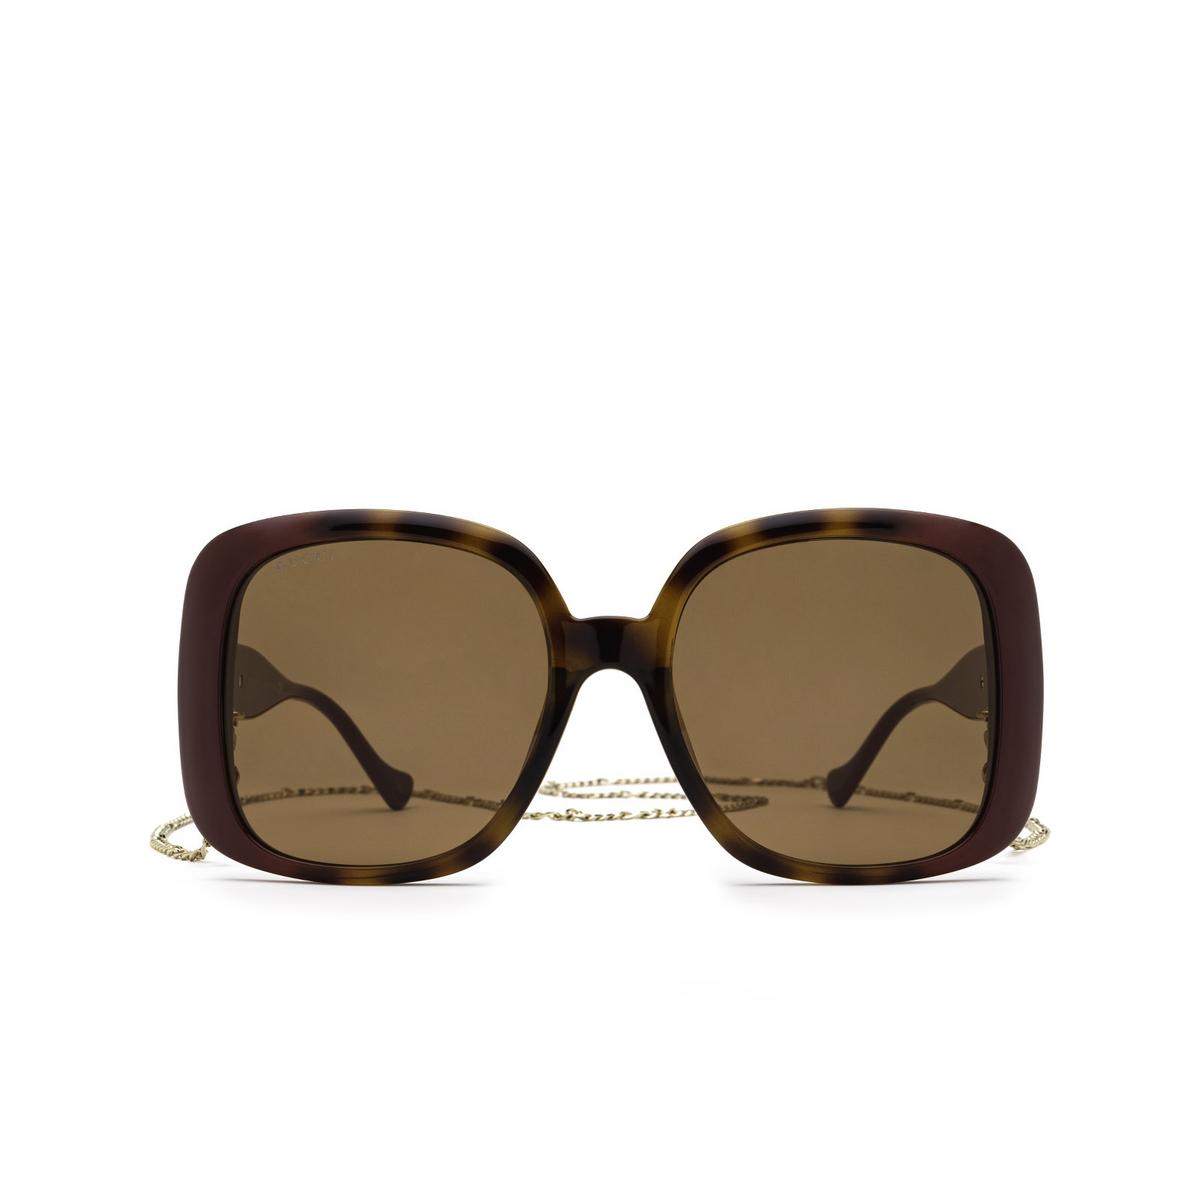 Gucci® Square Sunglasses: GG1029SA color Havana & Burgundy 003 - front view.